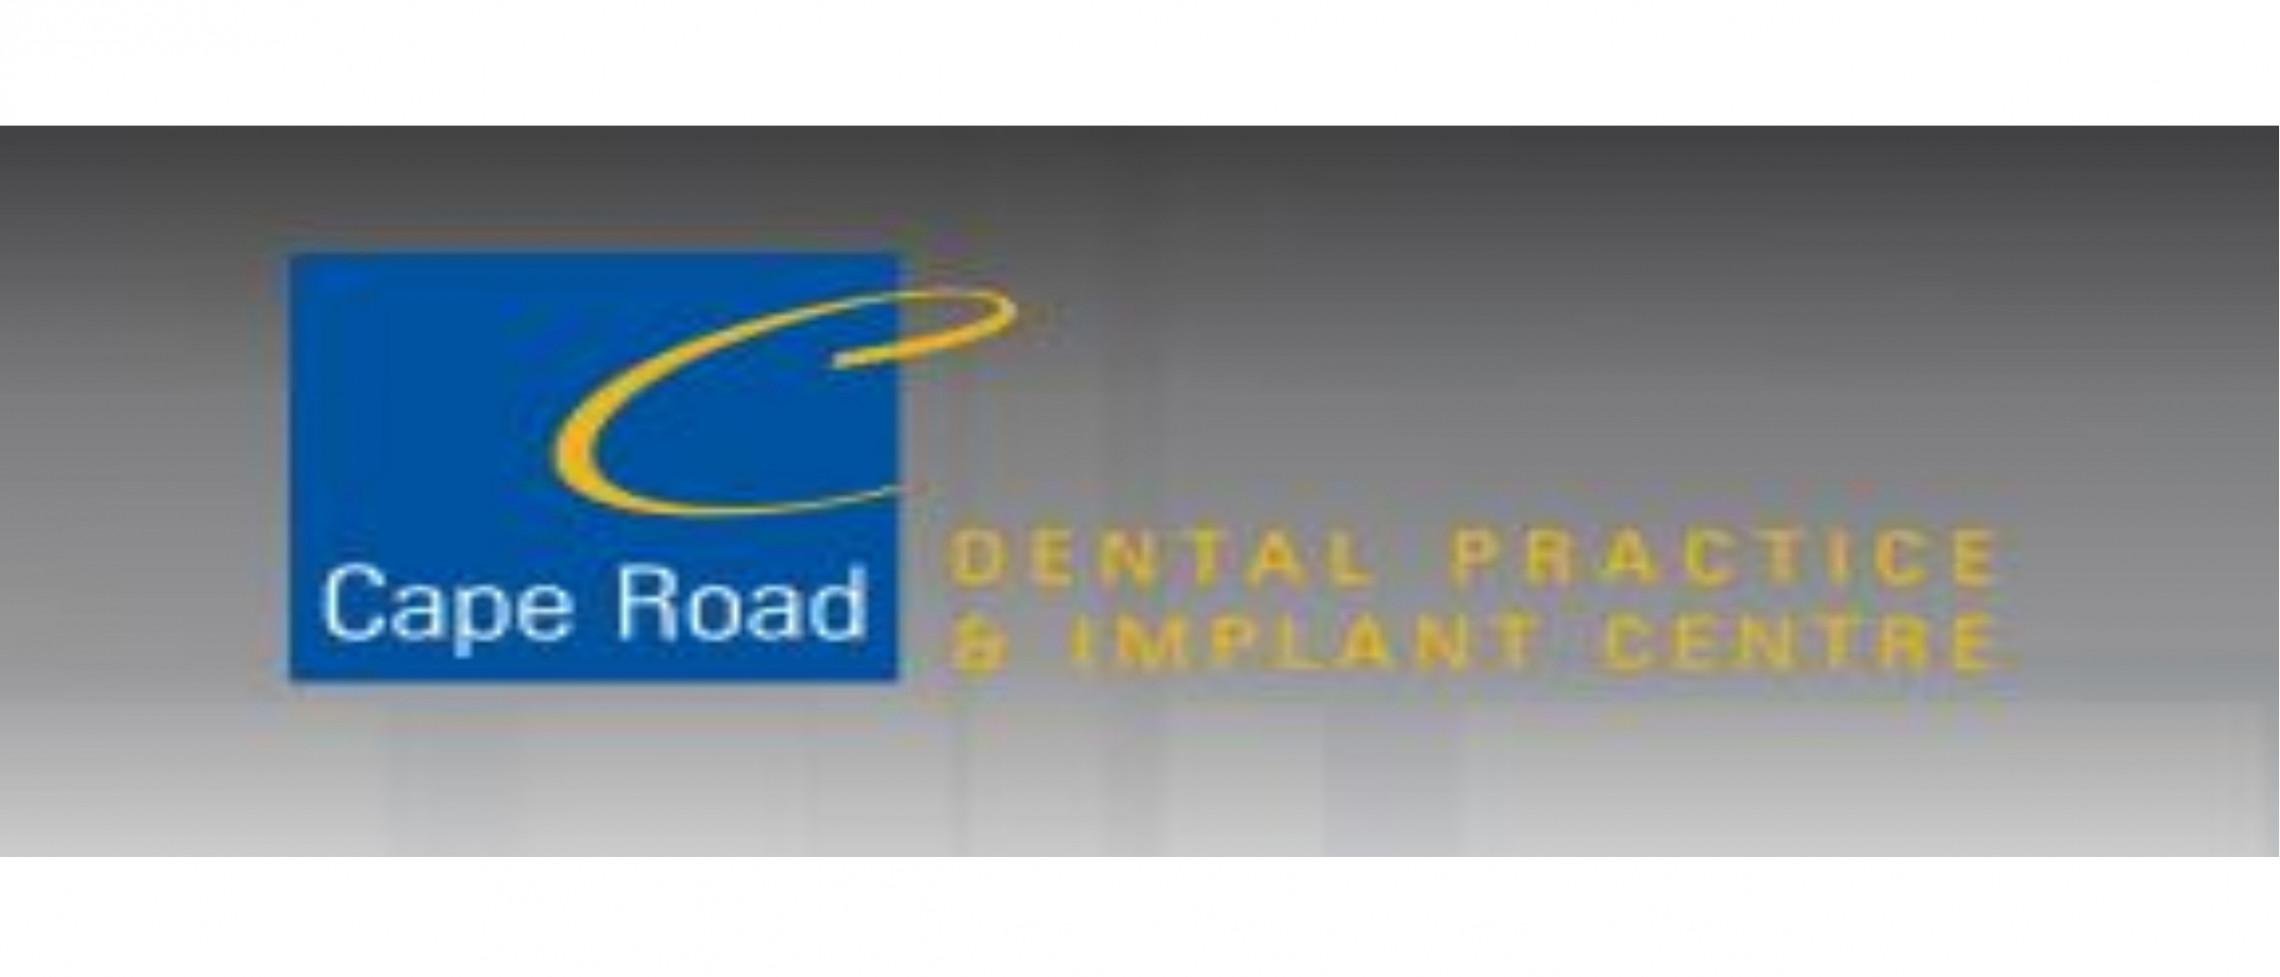 Cape Road Dental Practice